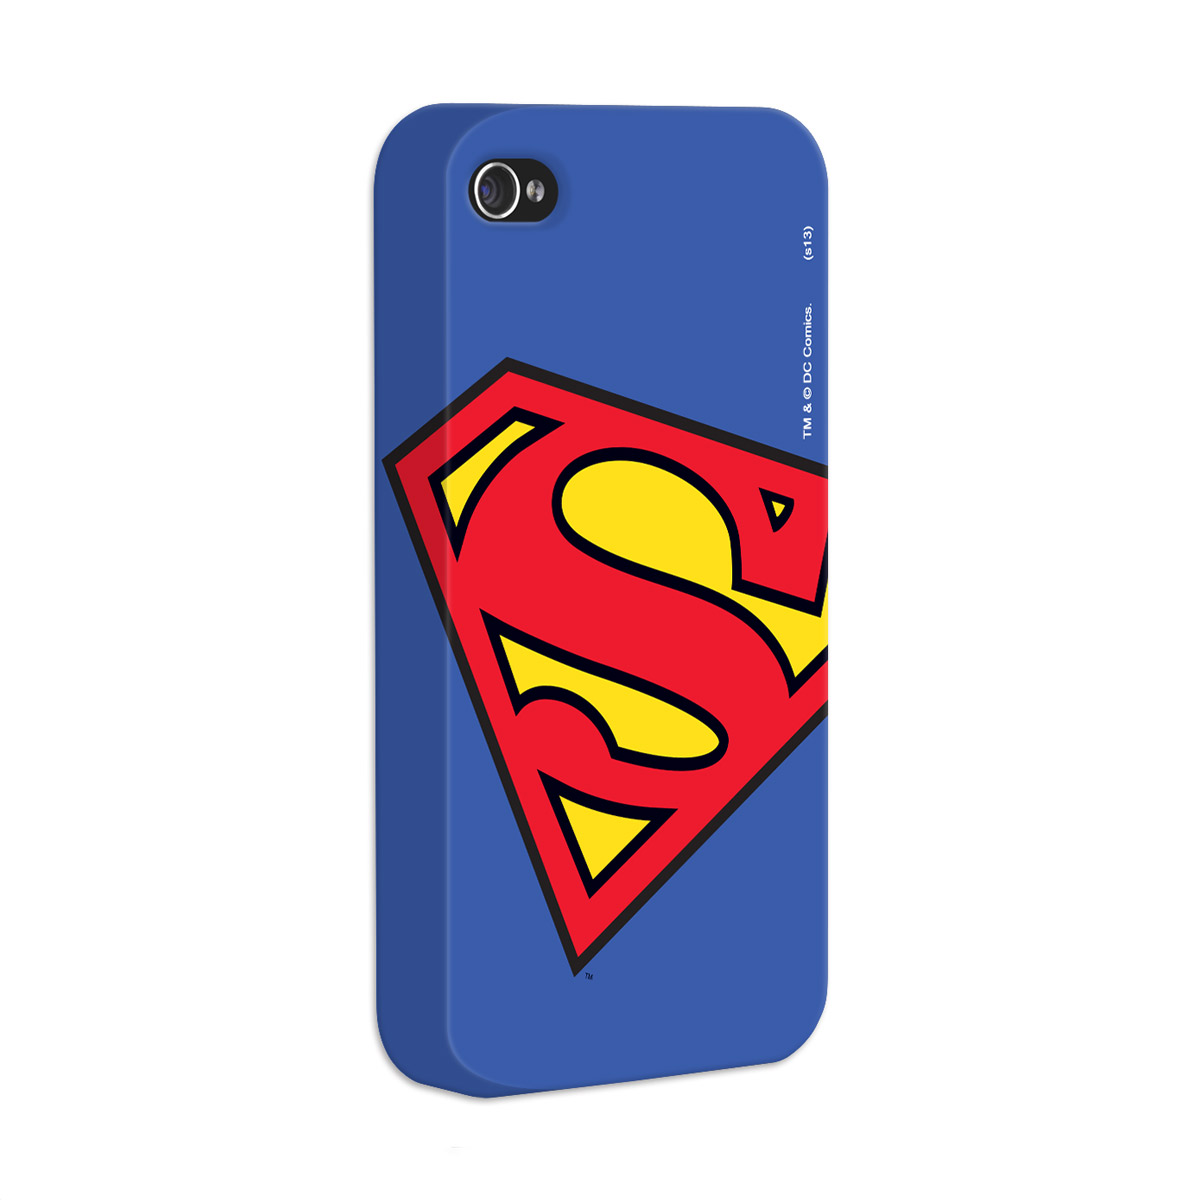 Capa de iPhone 4/4S Superman - Logo Superman Oficial